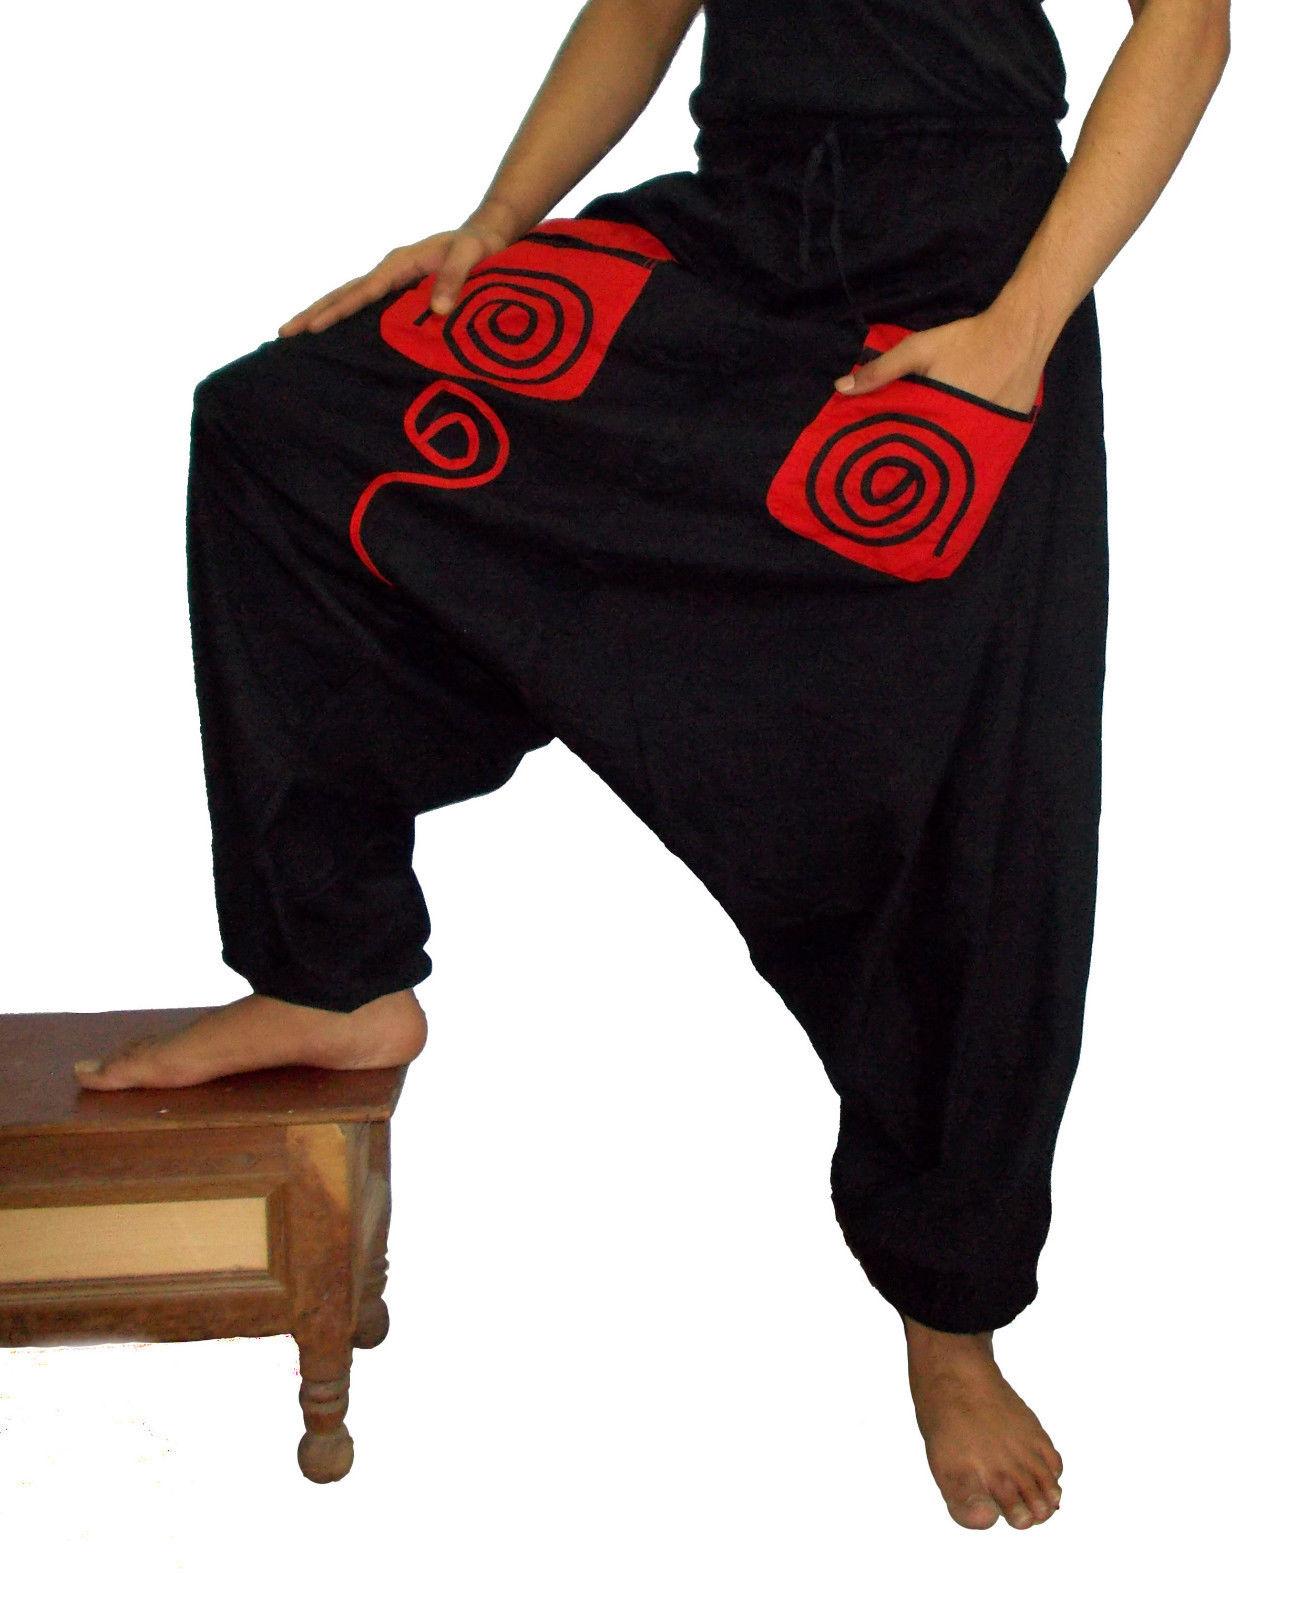 Vego 2015 New Men Women Harem Pants Yoga Casual Trousers Afghani Baggy Genie Hippie Aladdin(China (Mainland))